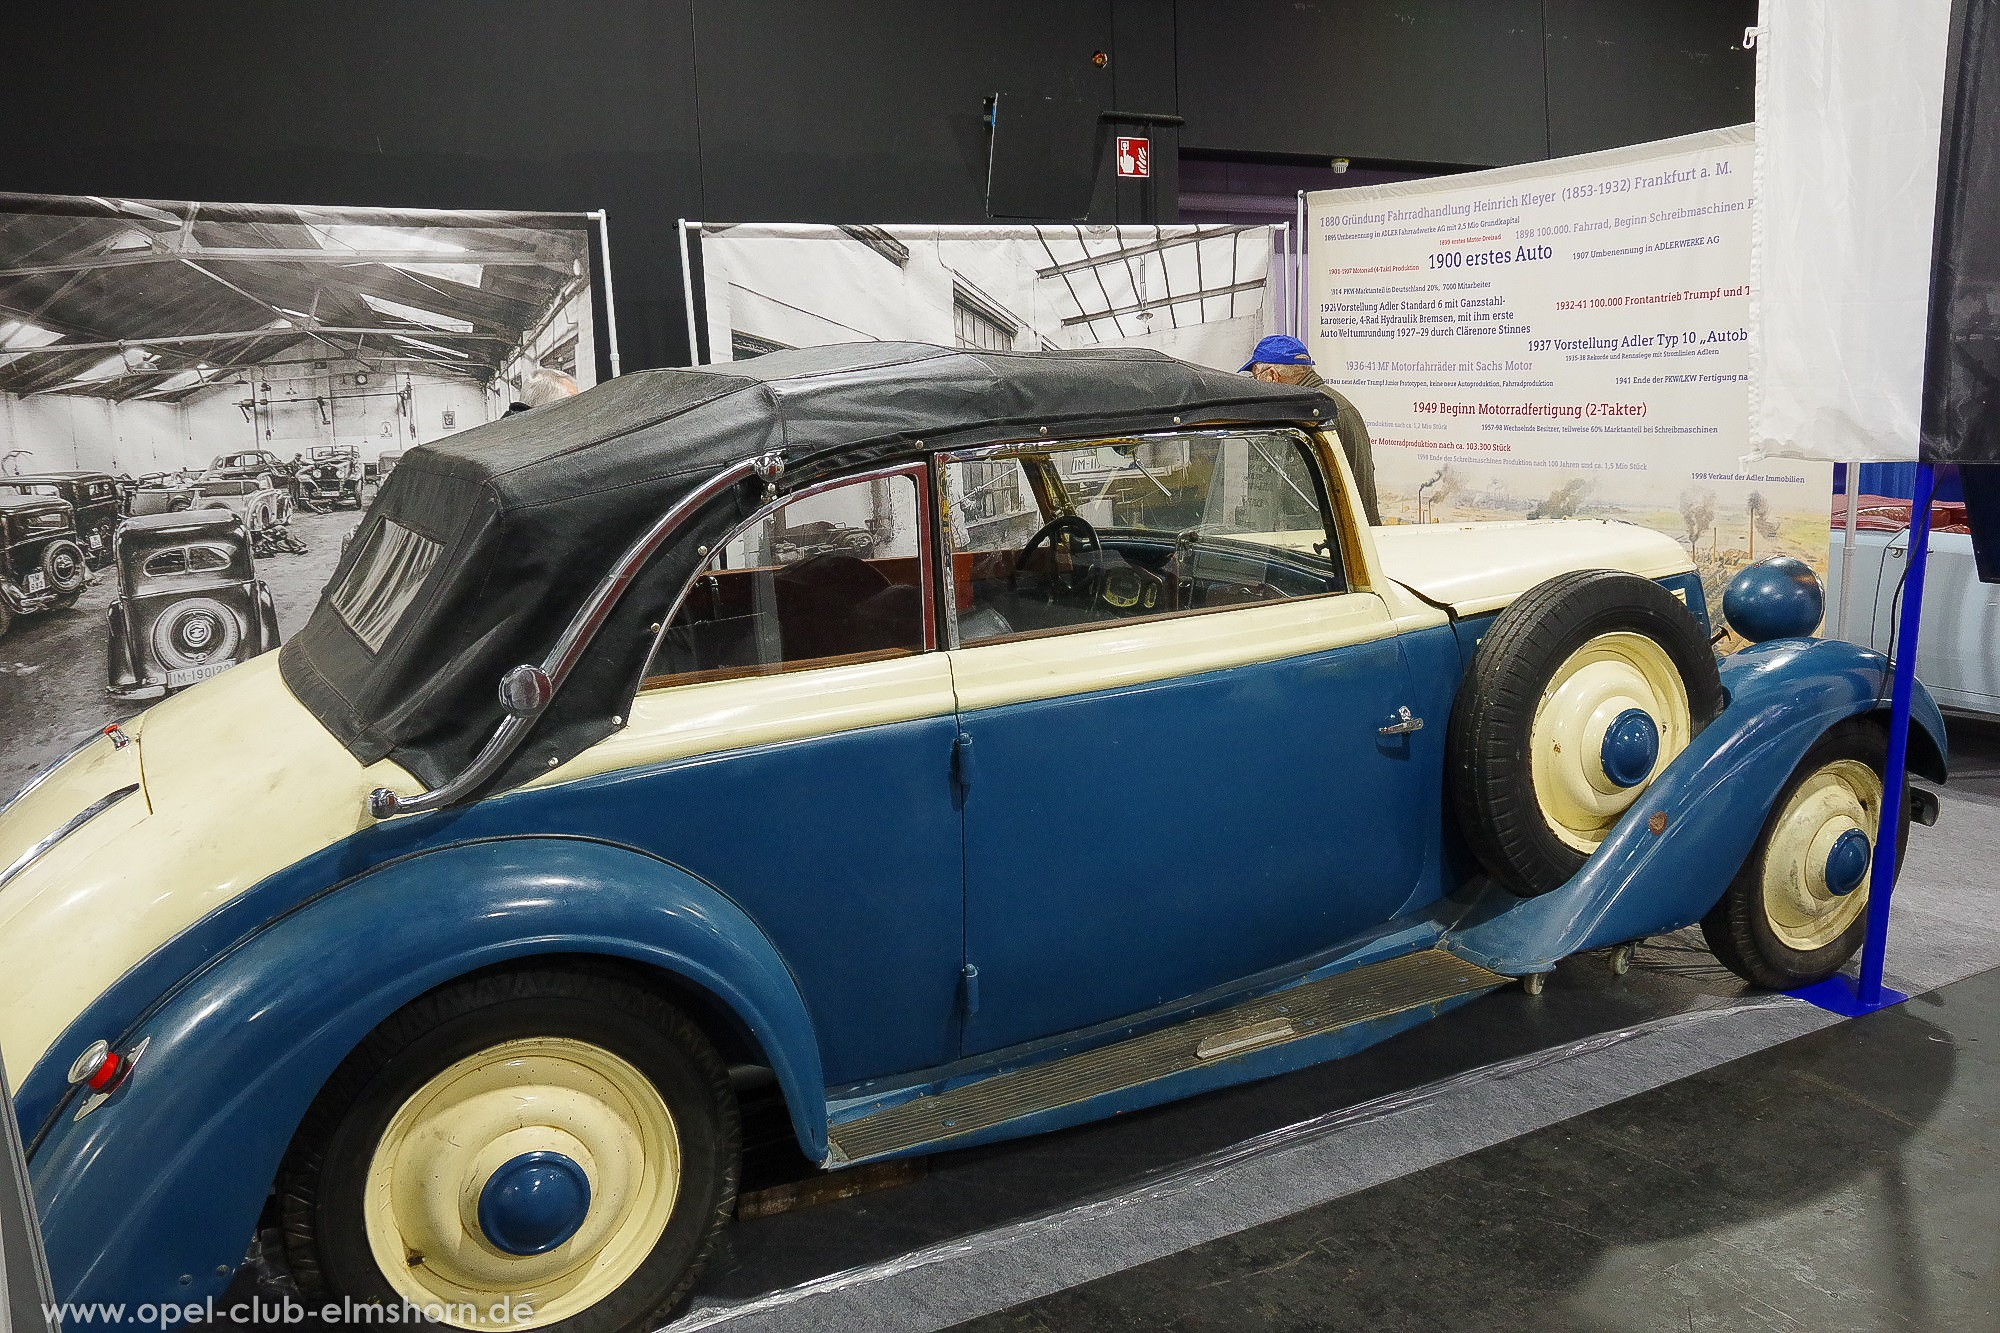 2020-02-02-Bremen-Classic-Motorshow-2020-20200201_102903-_